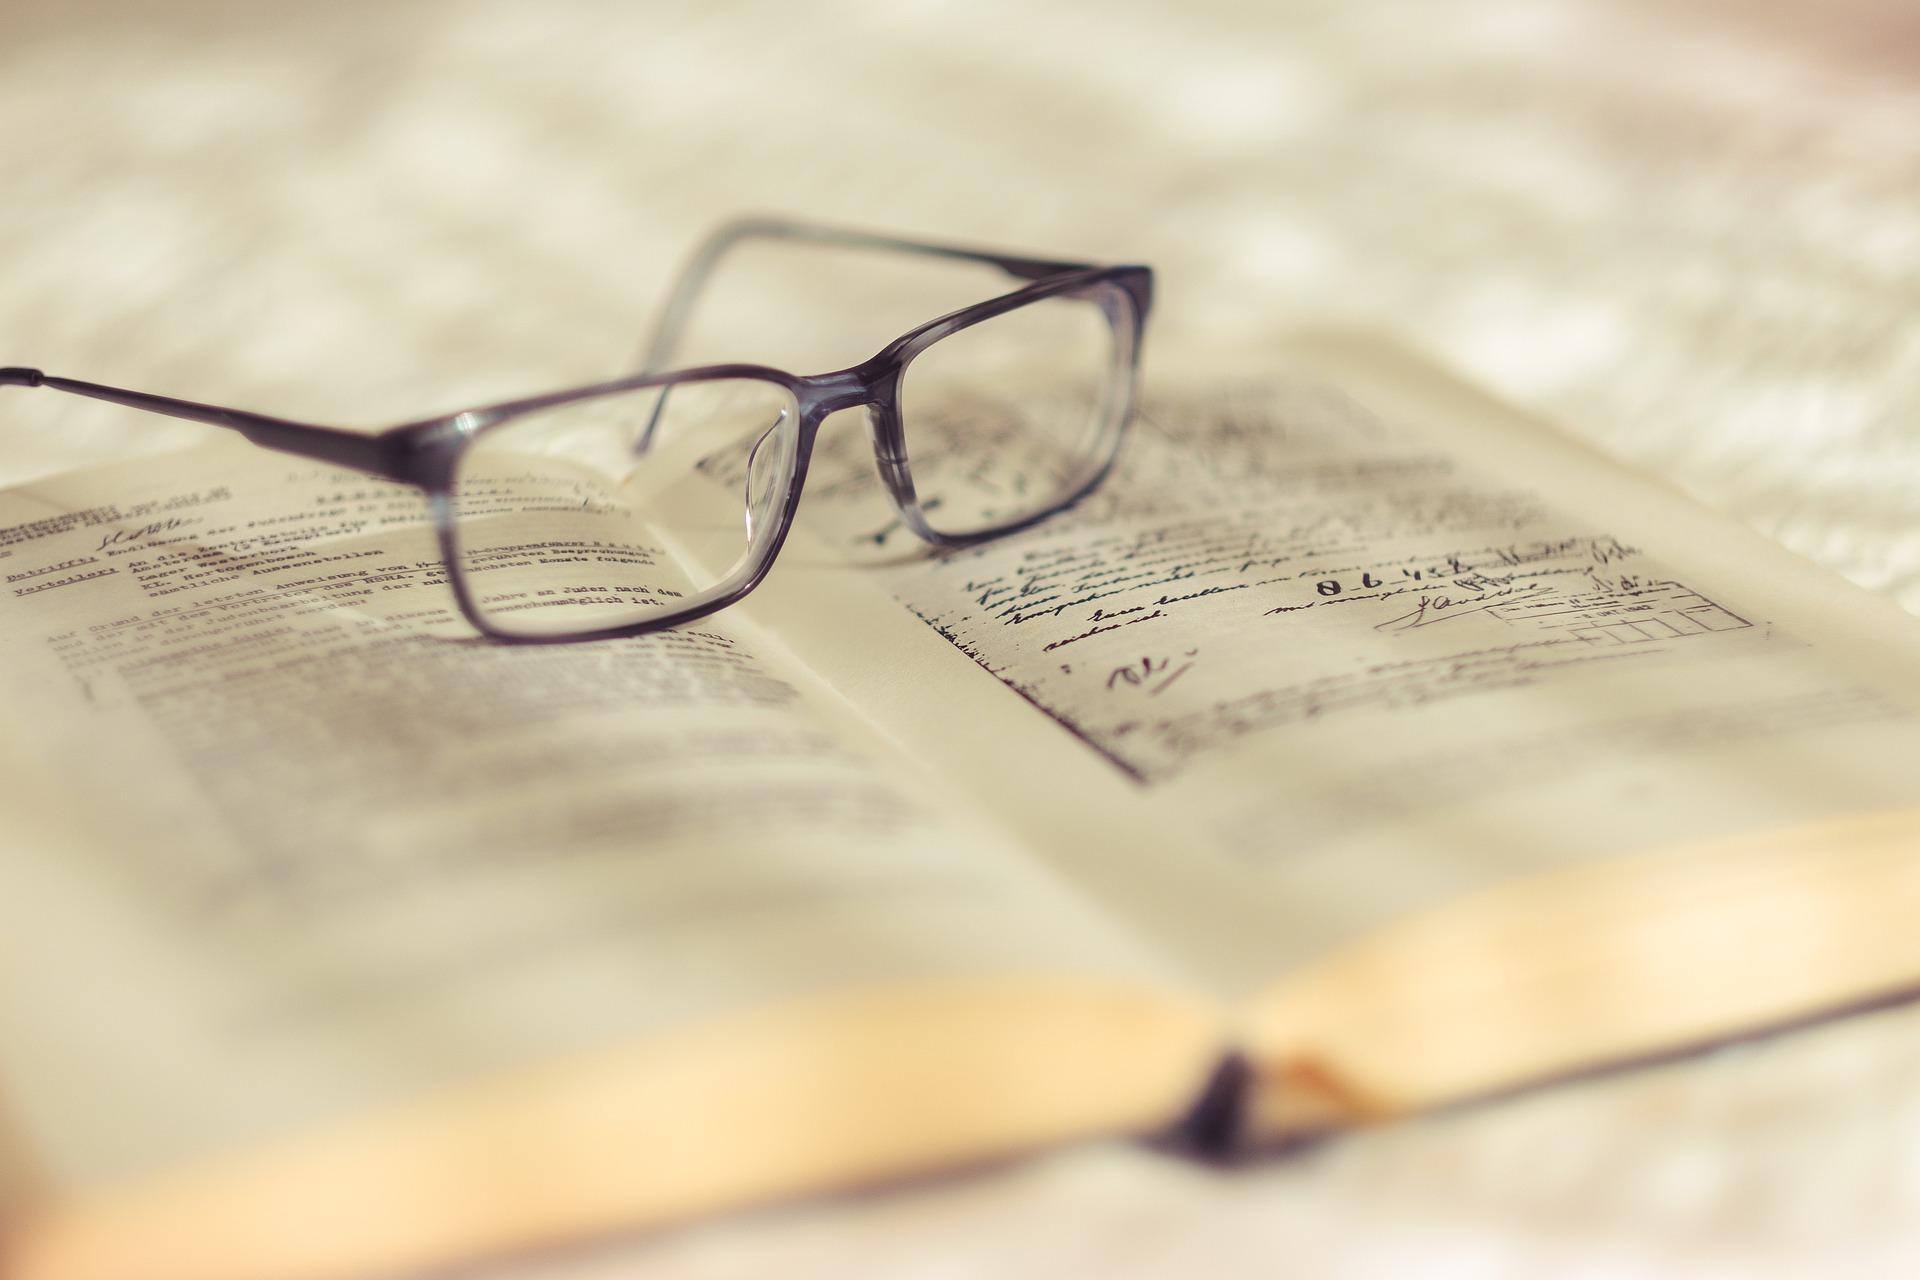 Visione binoculare e insufficienza di convergenza